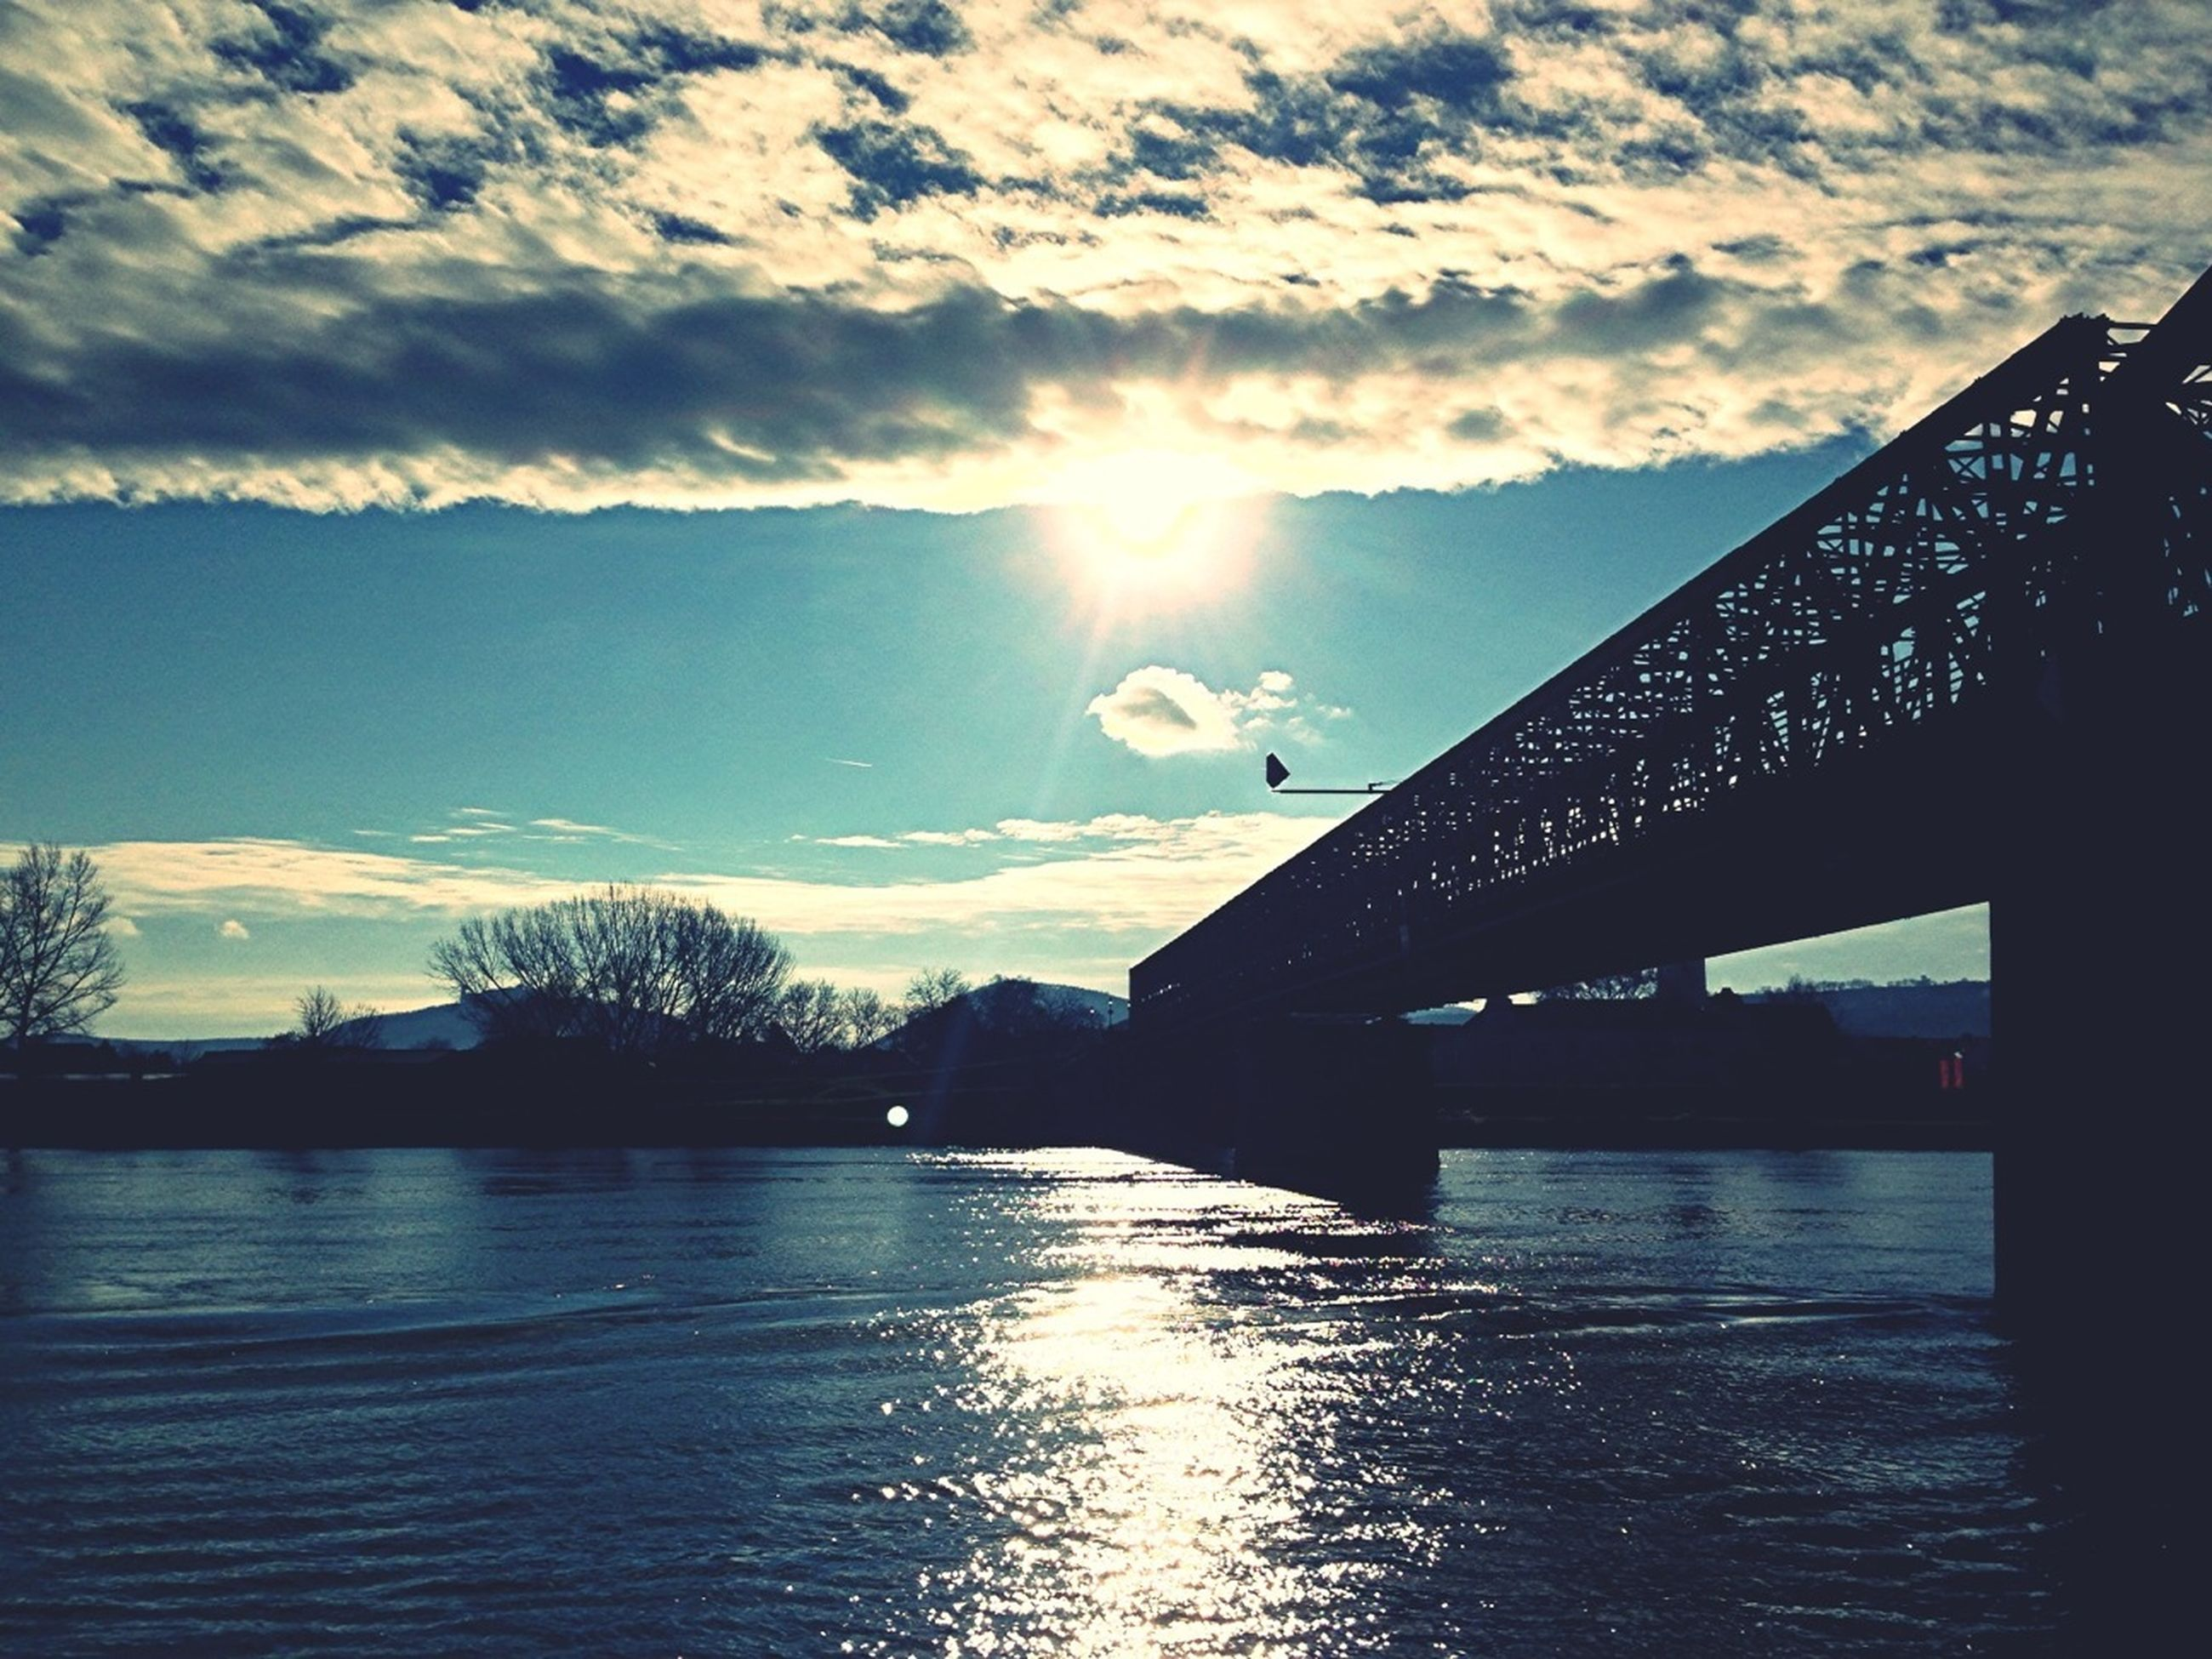 built structure, architecture, sun, sky, bridge - man made structure, water, river, building exterior, waterfront, connection, cloud - sky, sunbeam, sunlight, reflection, sunset, cloud, bridge, lens flare, silhouette, city